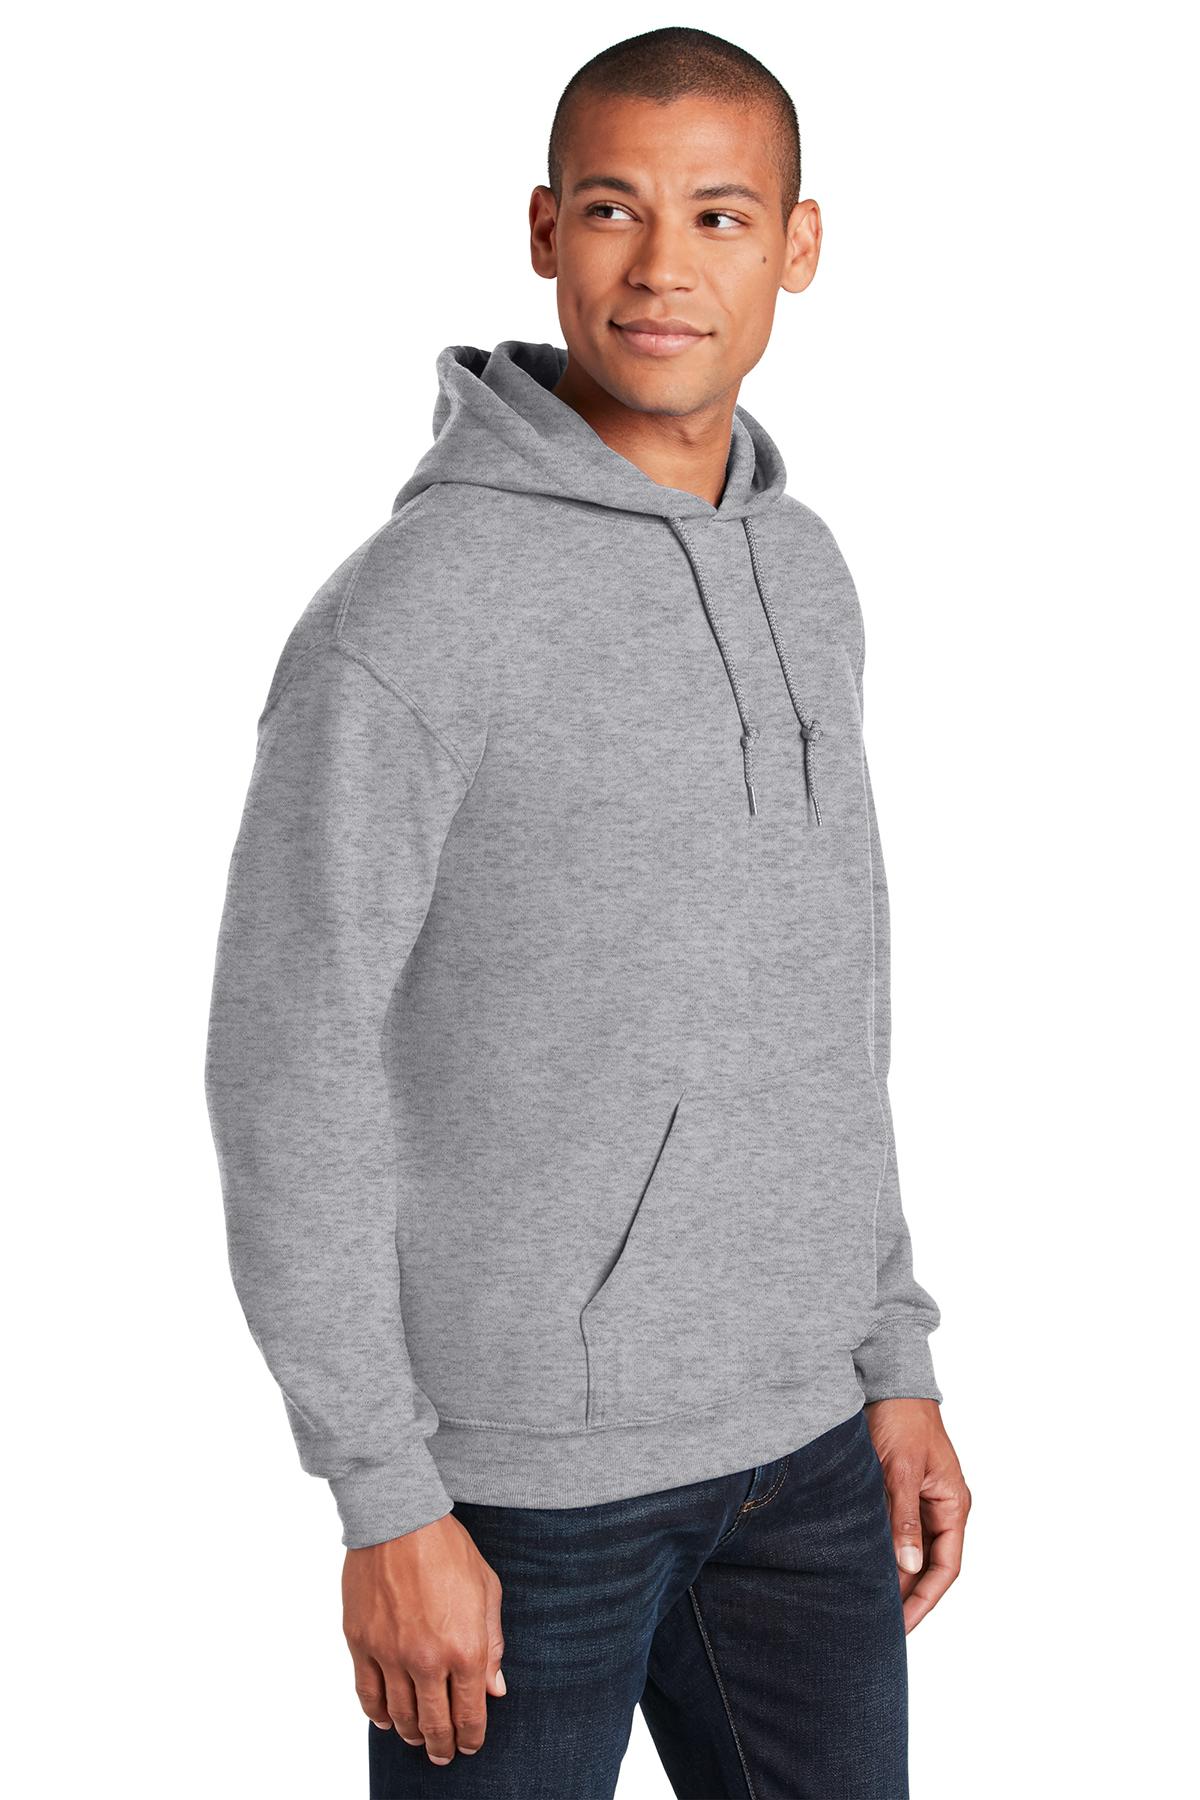 Gildan G18500 Heavy Blend Adult Hooded Sweatshirt L 1 Ash 1 Dark Heather